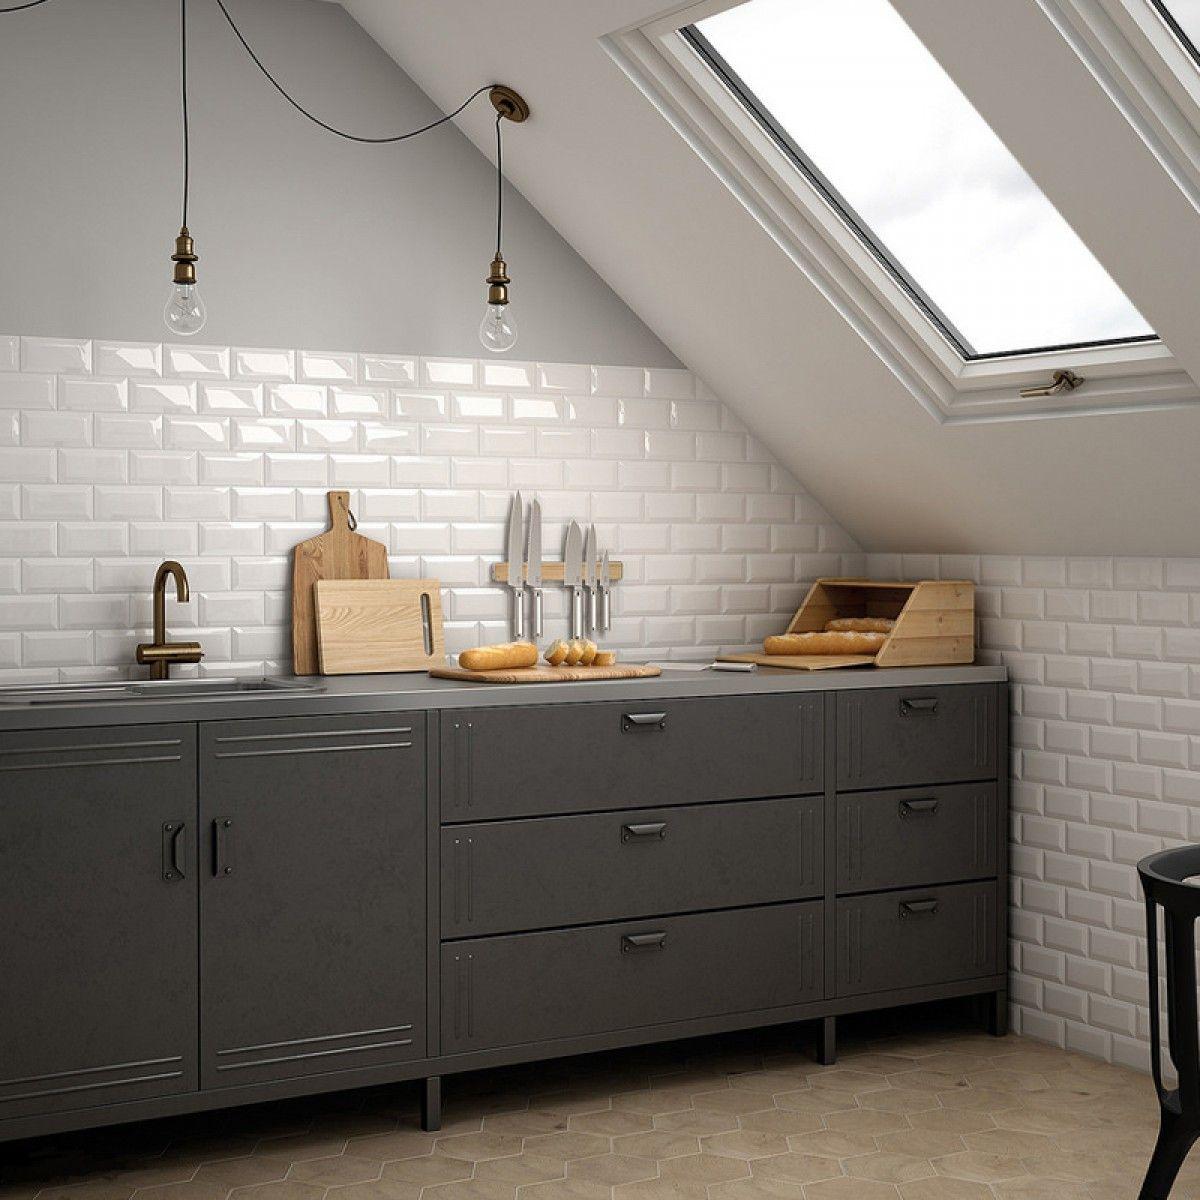 Mini Metro White Wall Tile. SKU - 329255. www.crowntiles.co.uk ...